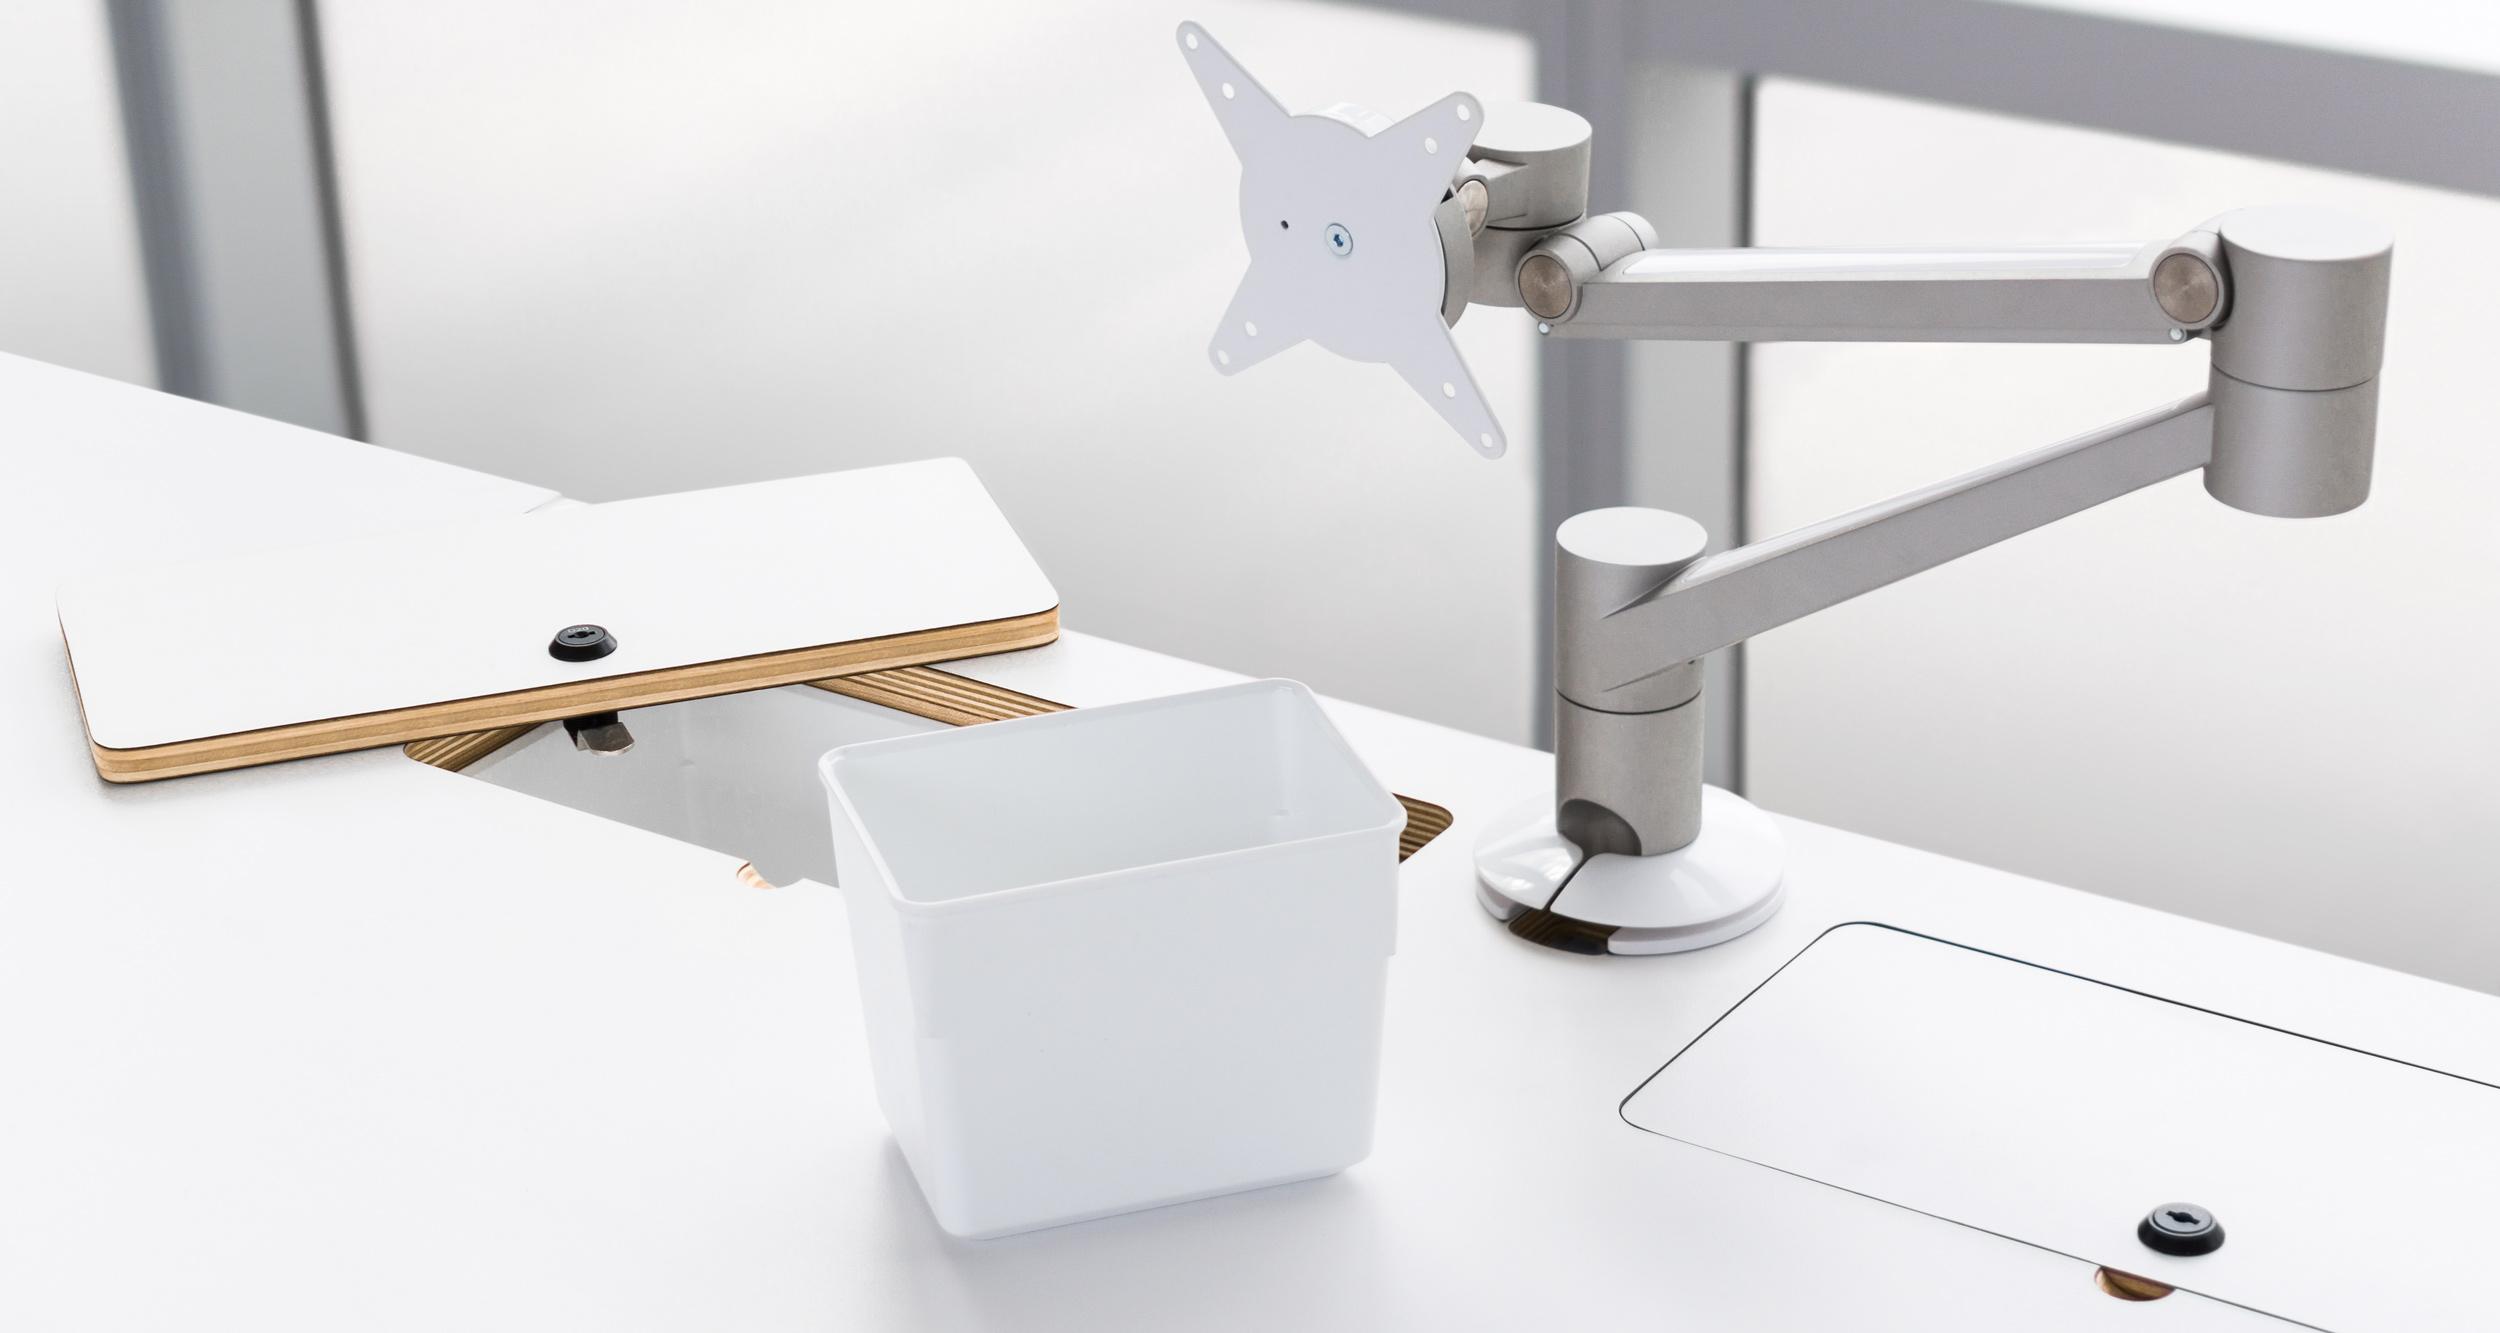 BLINC-Workstation-4-Michael-Peel-Design